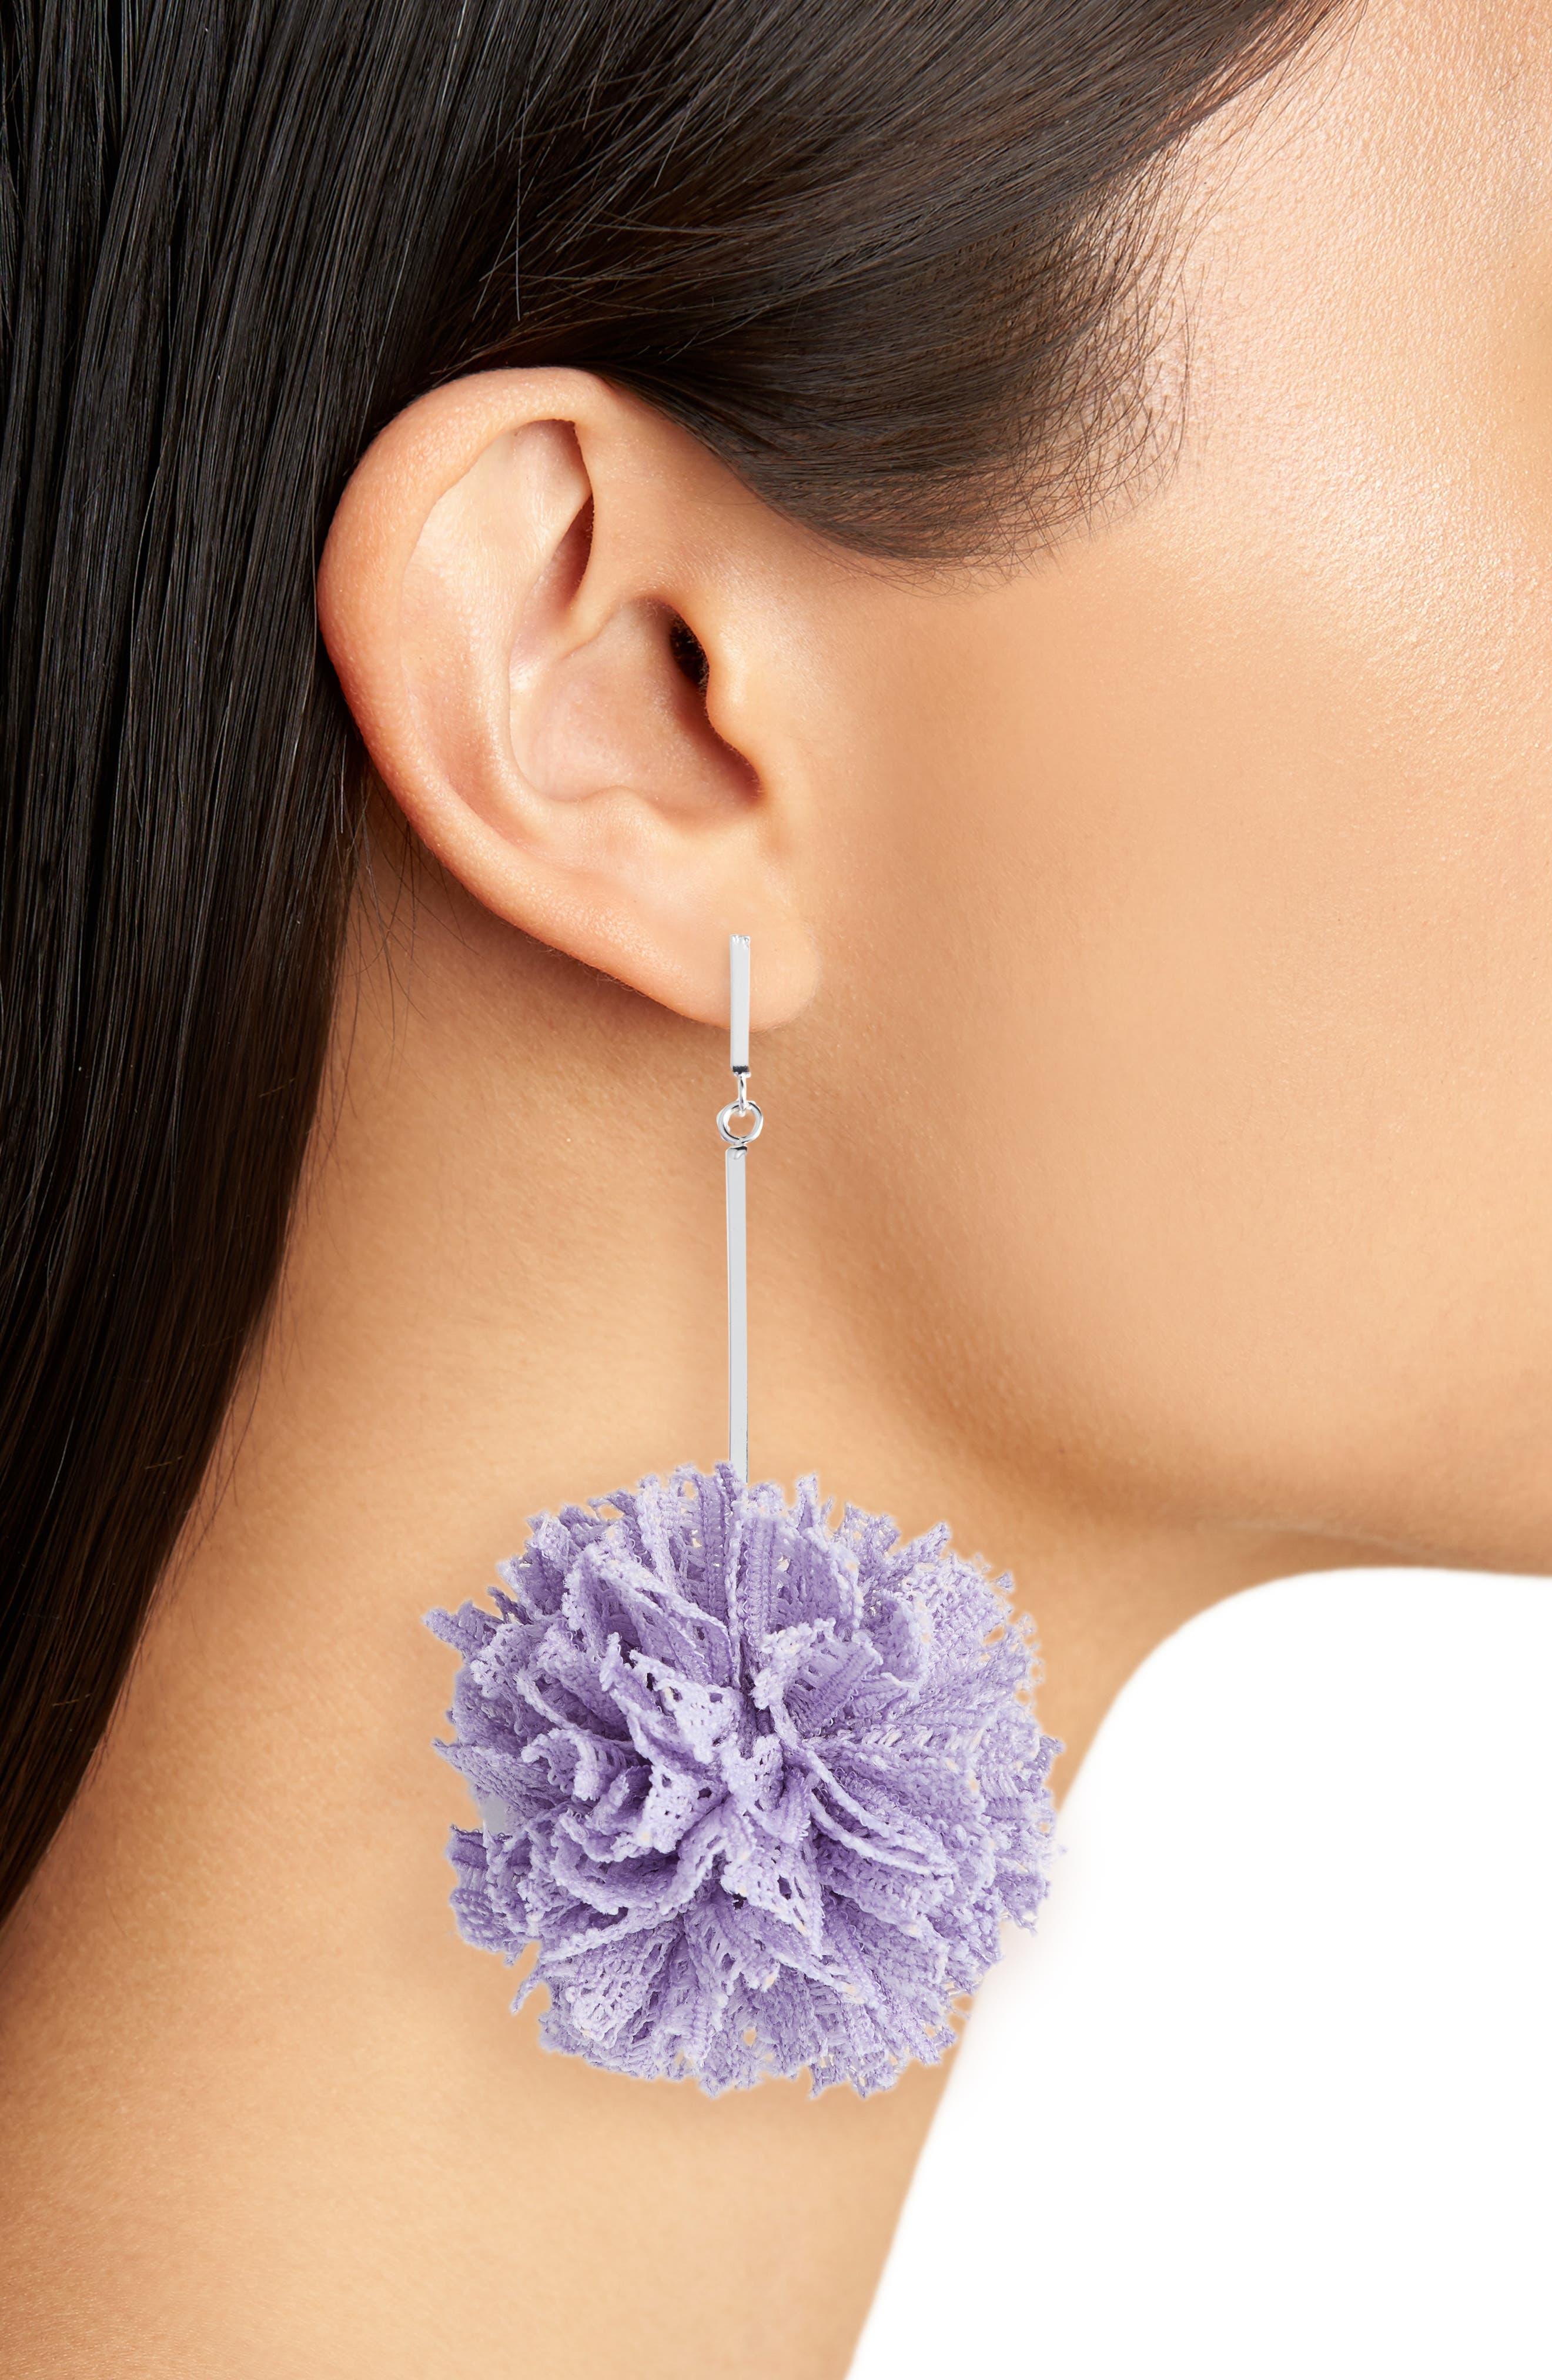 Lace Pom Pom Earrings,                             Alternate thumbnail 2, color,                             Silver/ Lavender